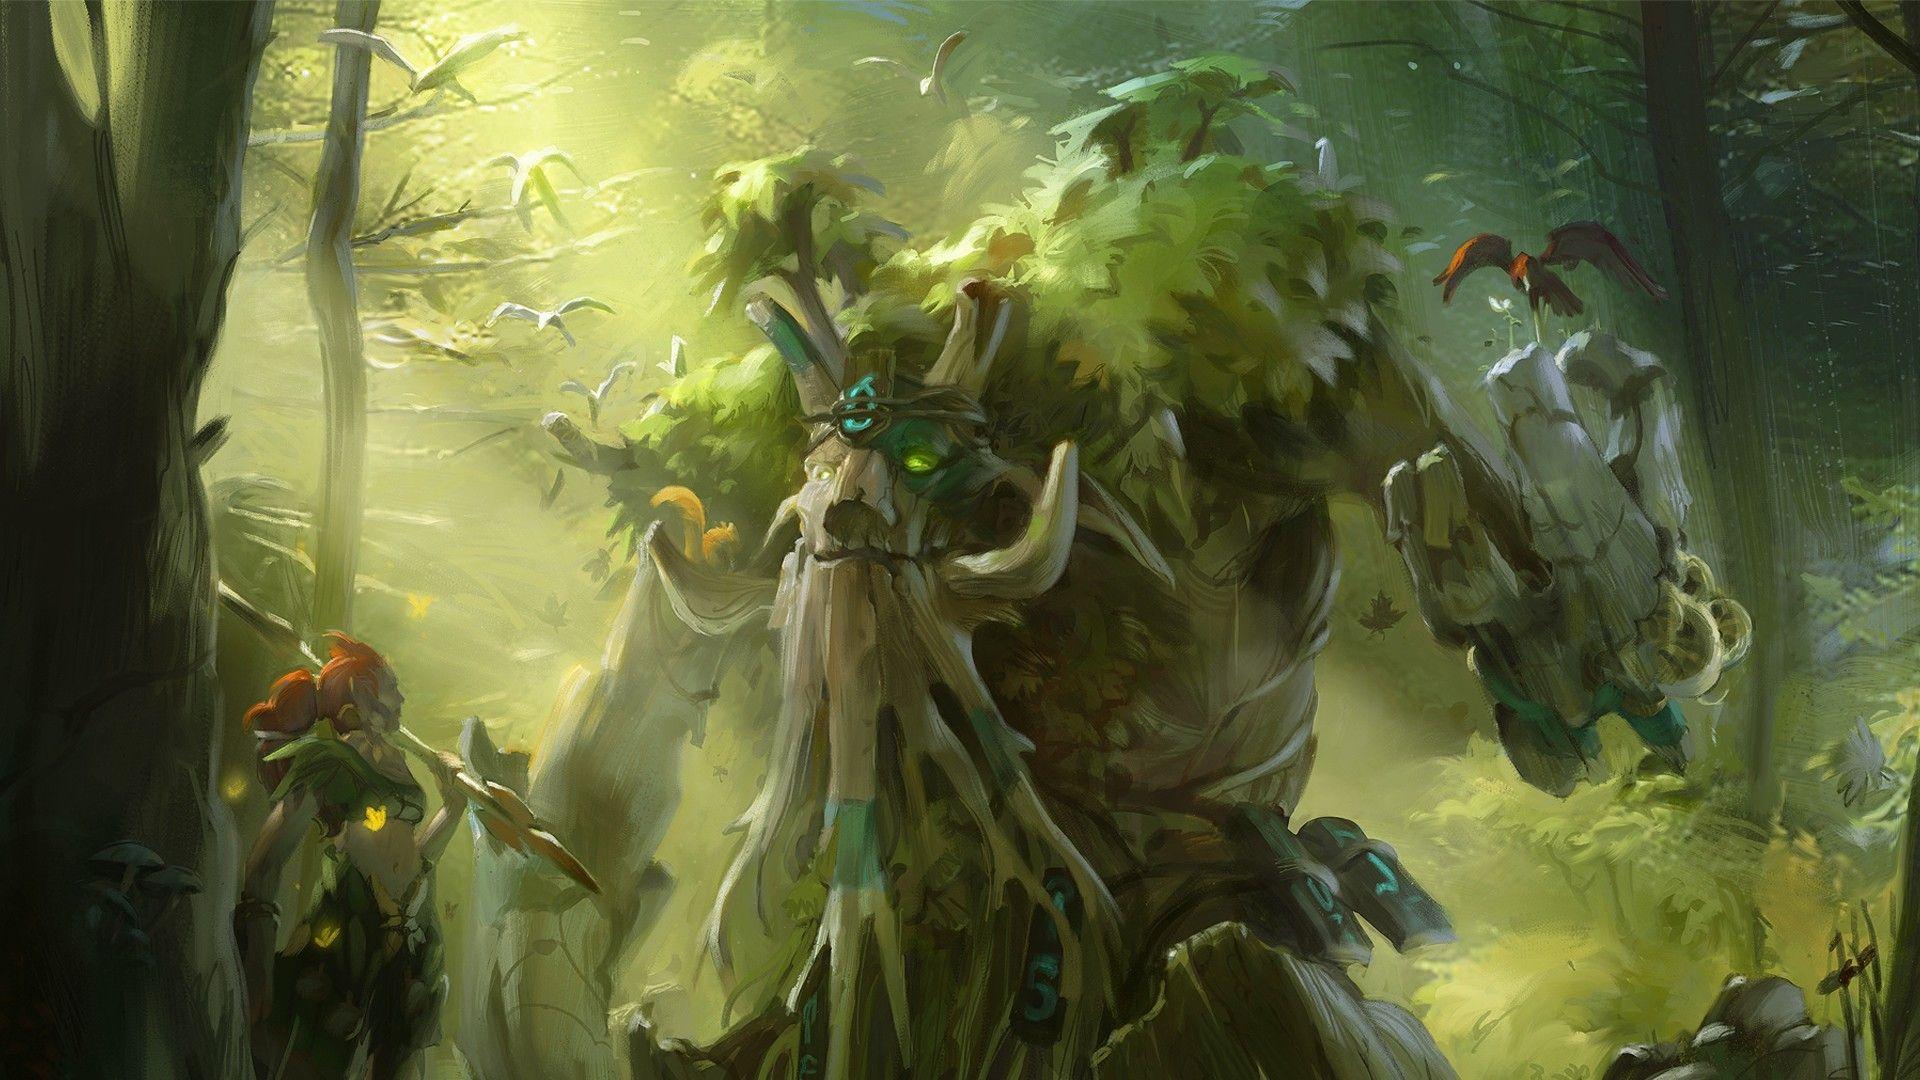 Dota 2 - Enchantress and Treant Protector